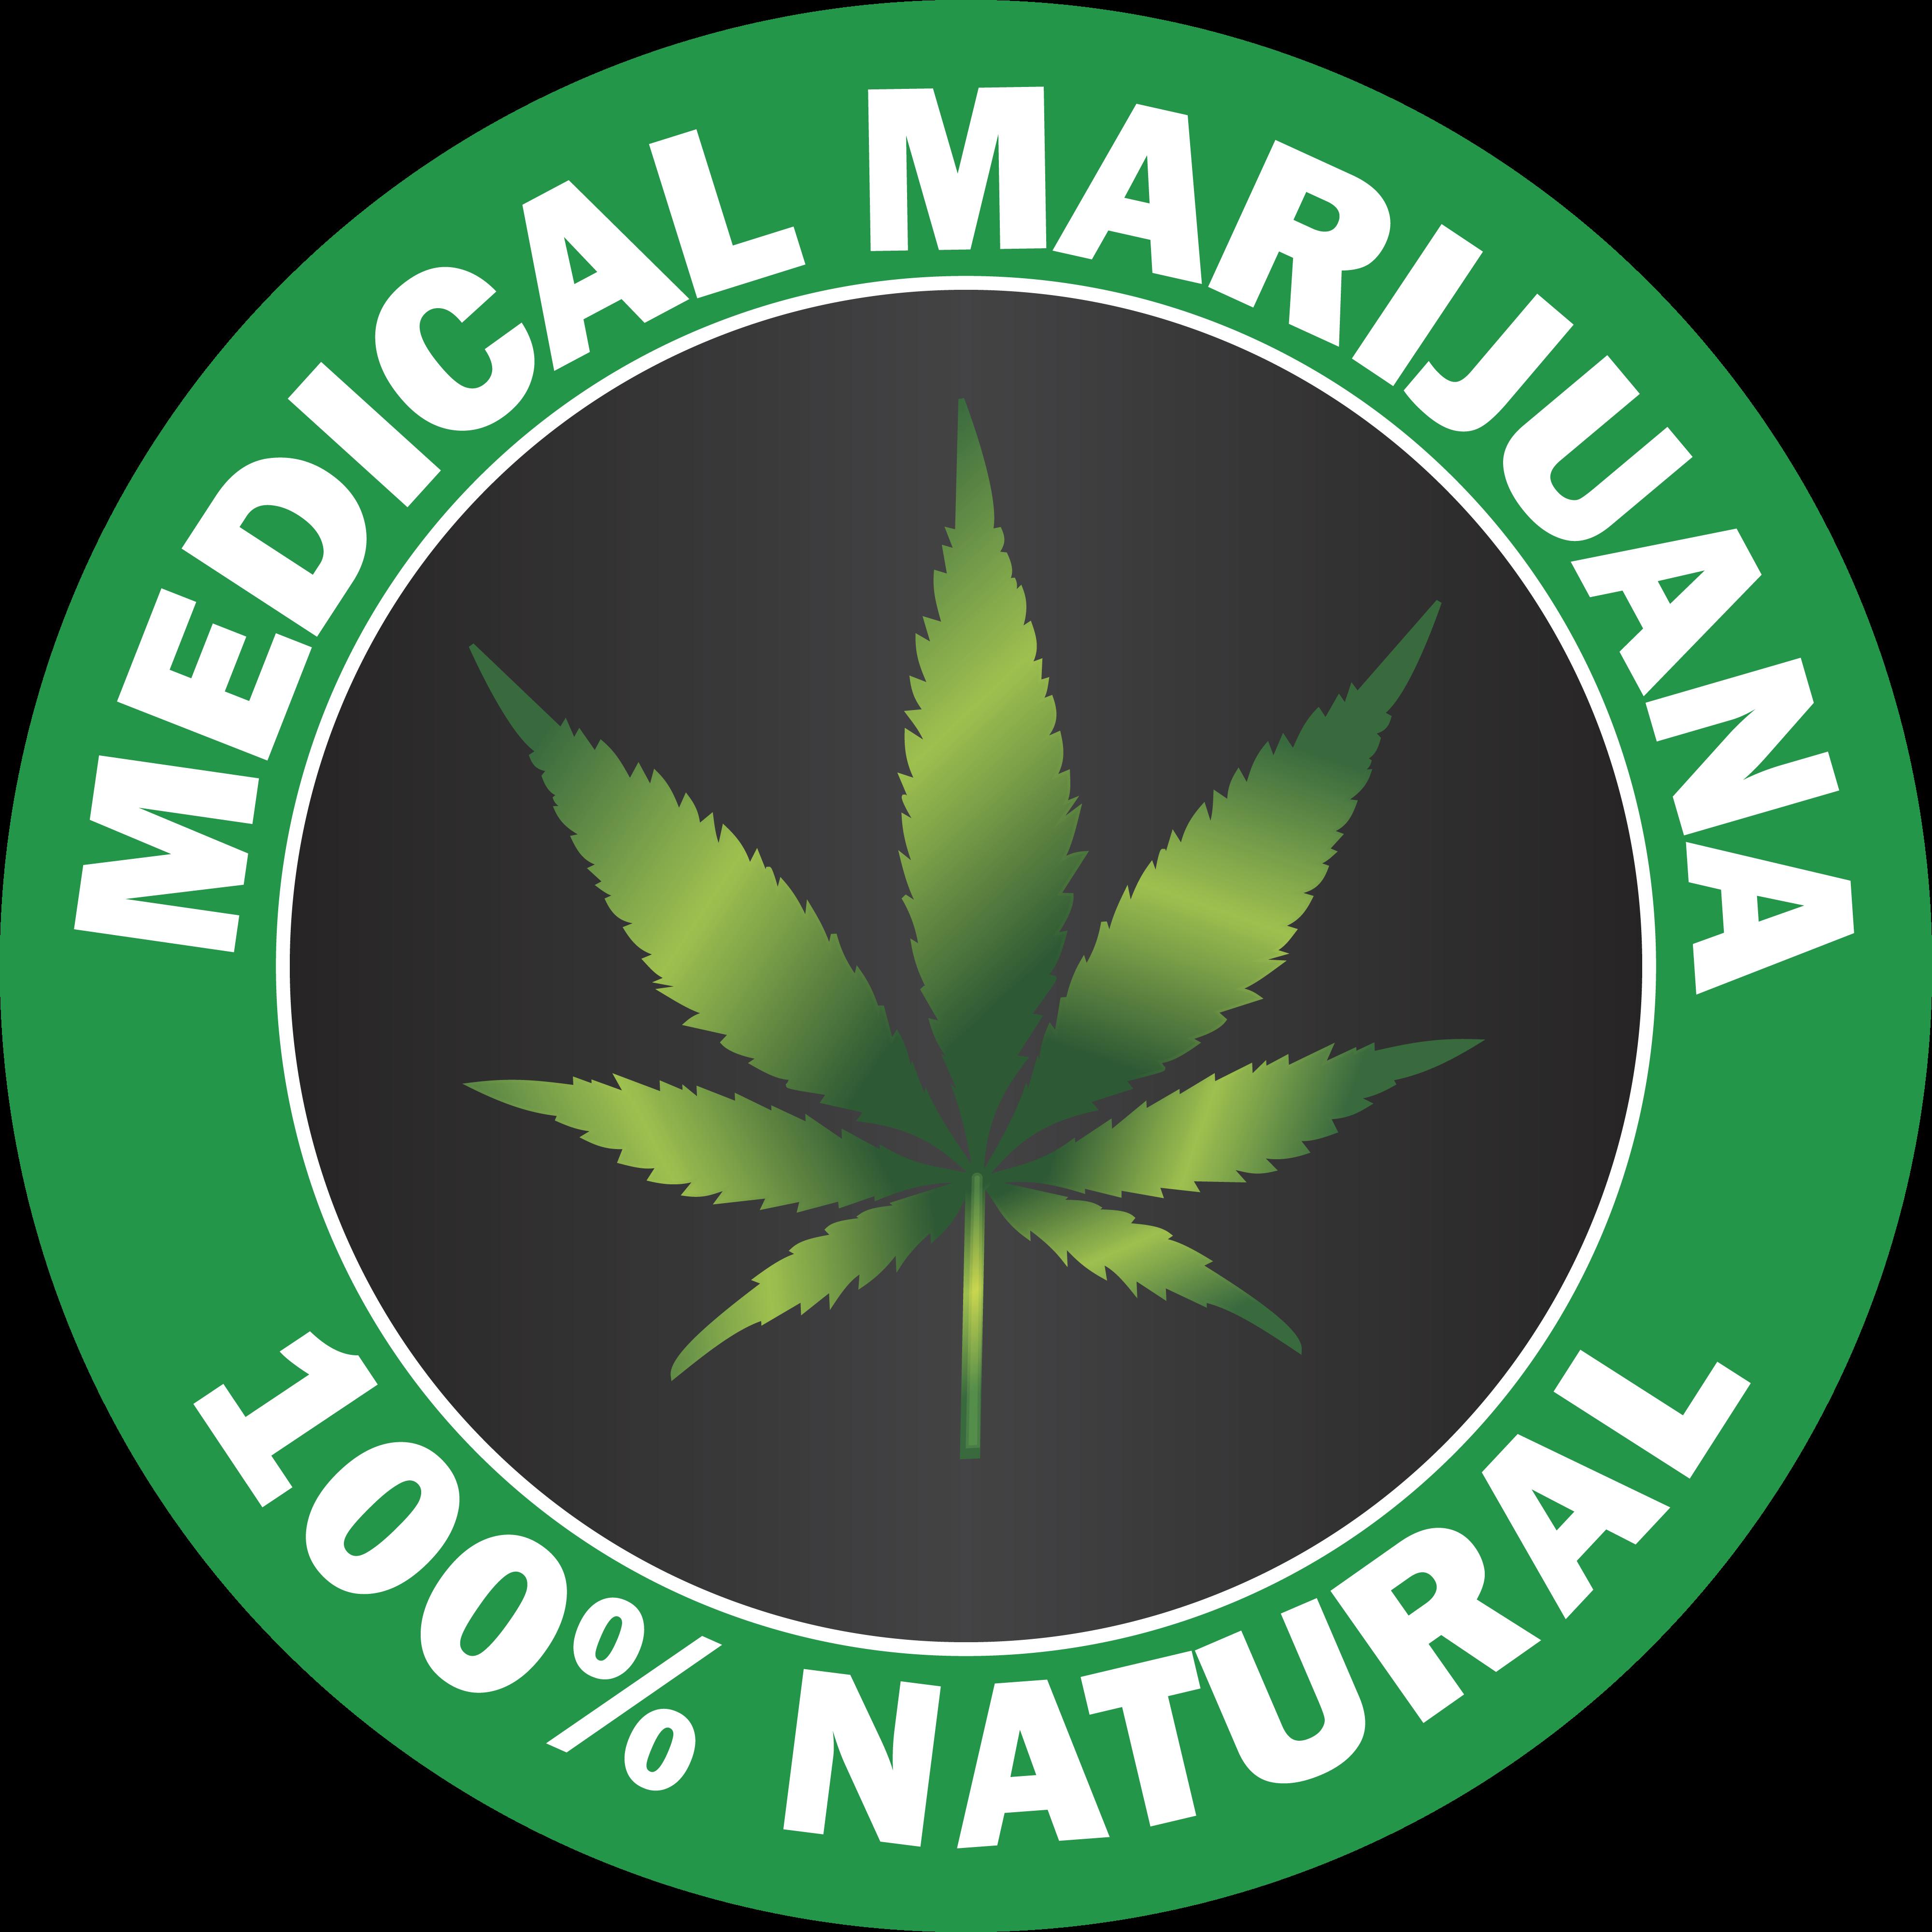 Free Clipart Of A Cannabis Leaf